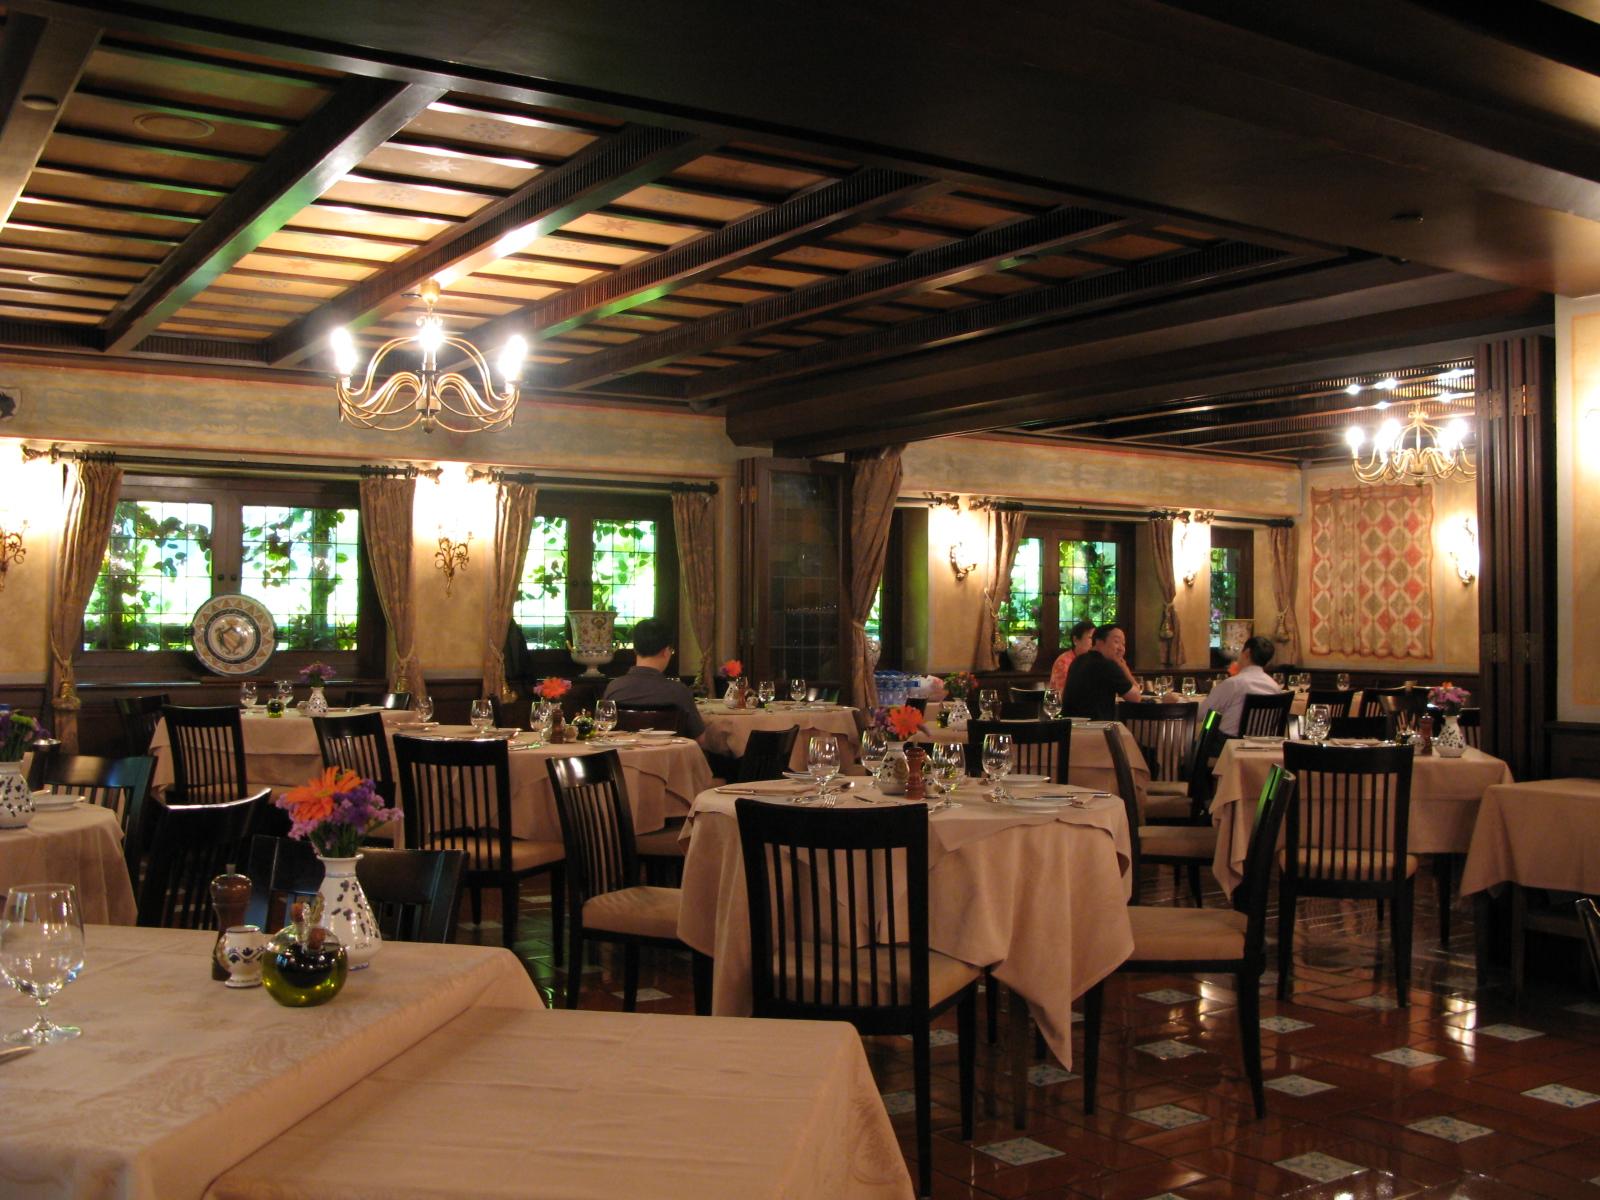 File:Royal Garden Hotel Sabatini 2009.JPG - Wikimedia Commons